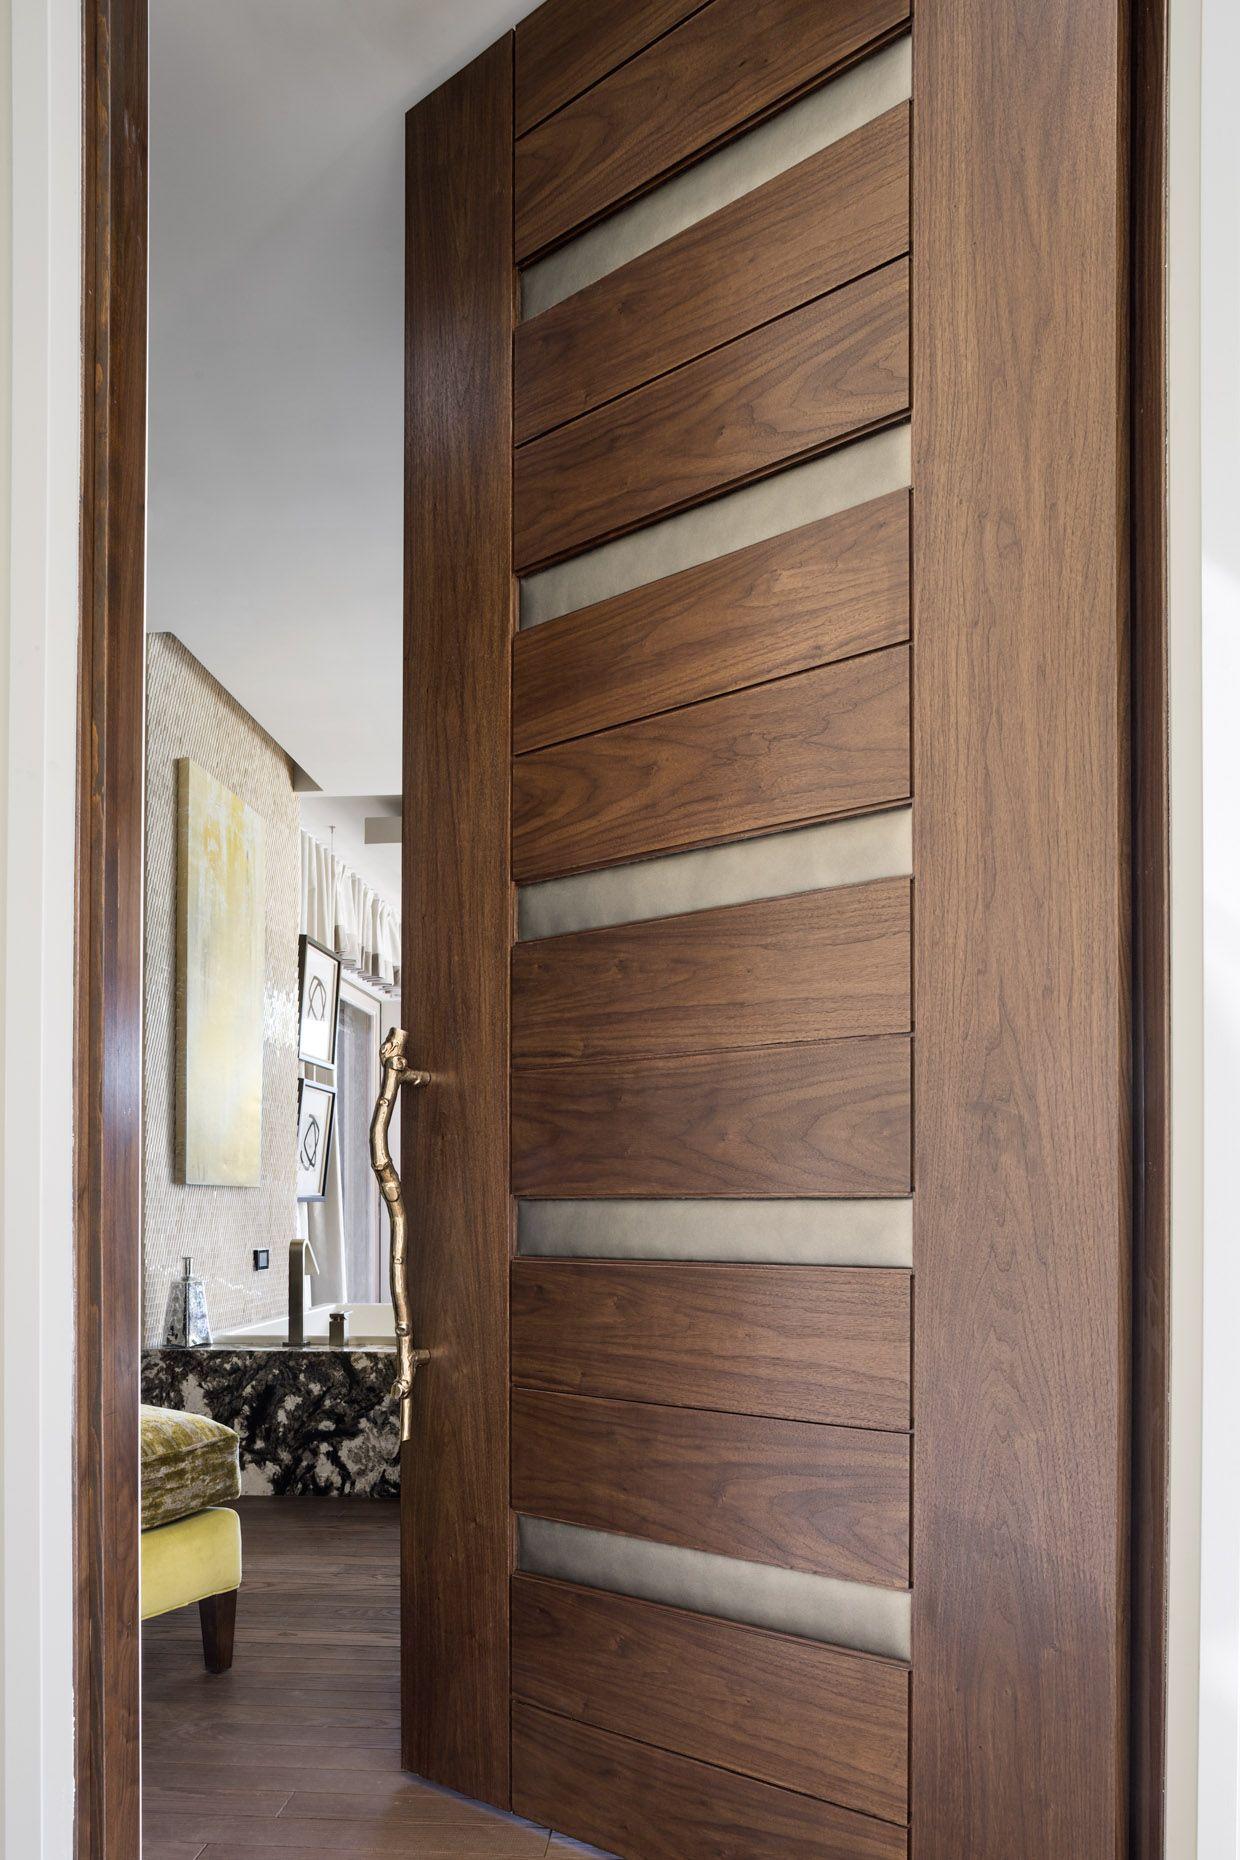 Pin By Trustile Doors On Modern Home In Las Vegas Door Design Modern Door Design Interior Doors Interior Modern